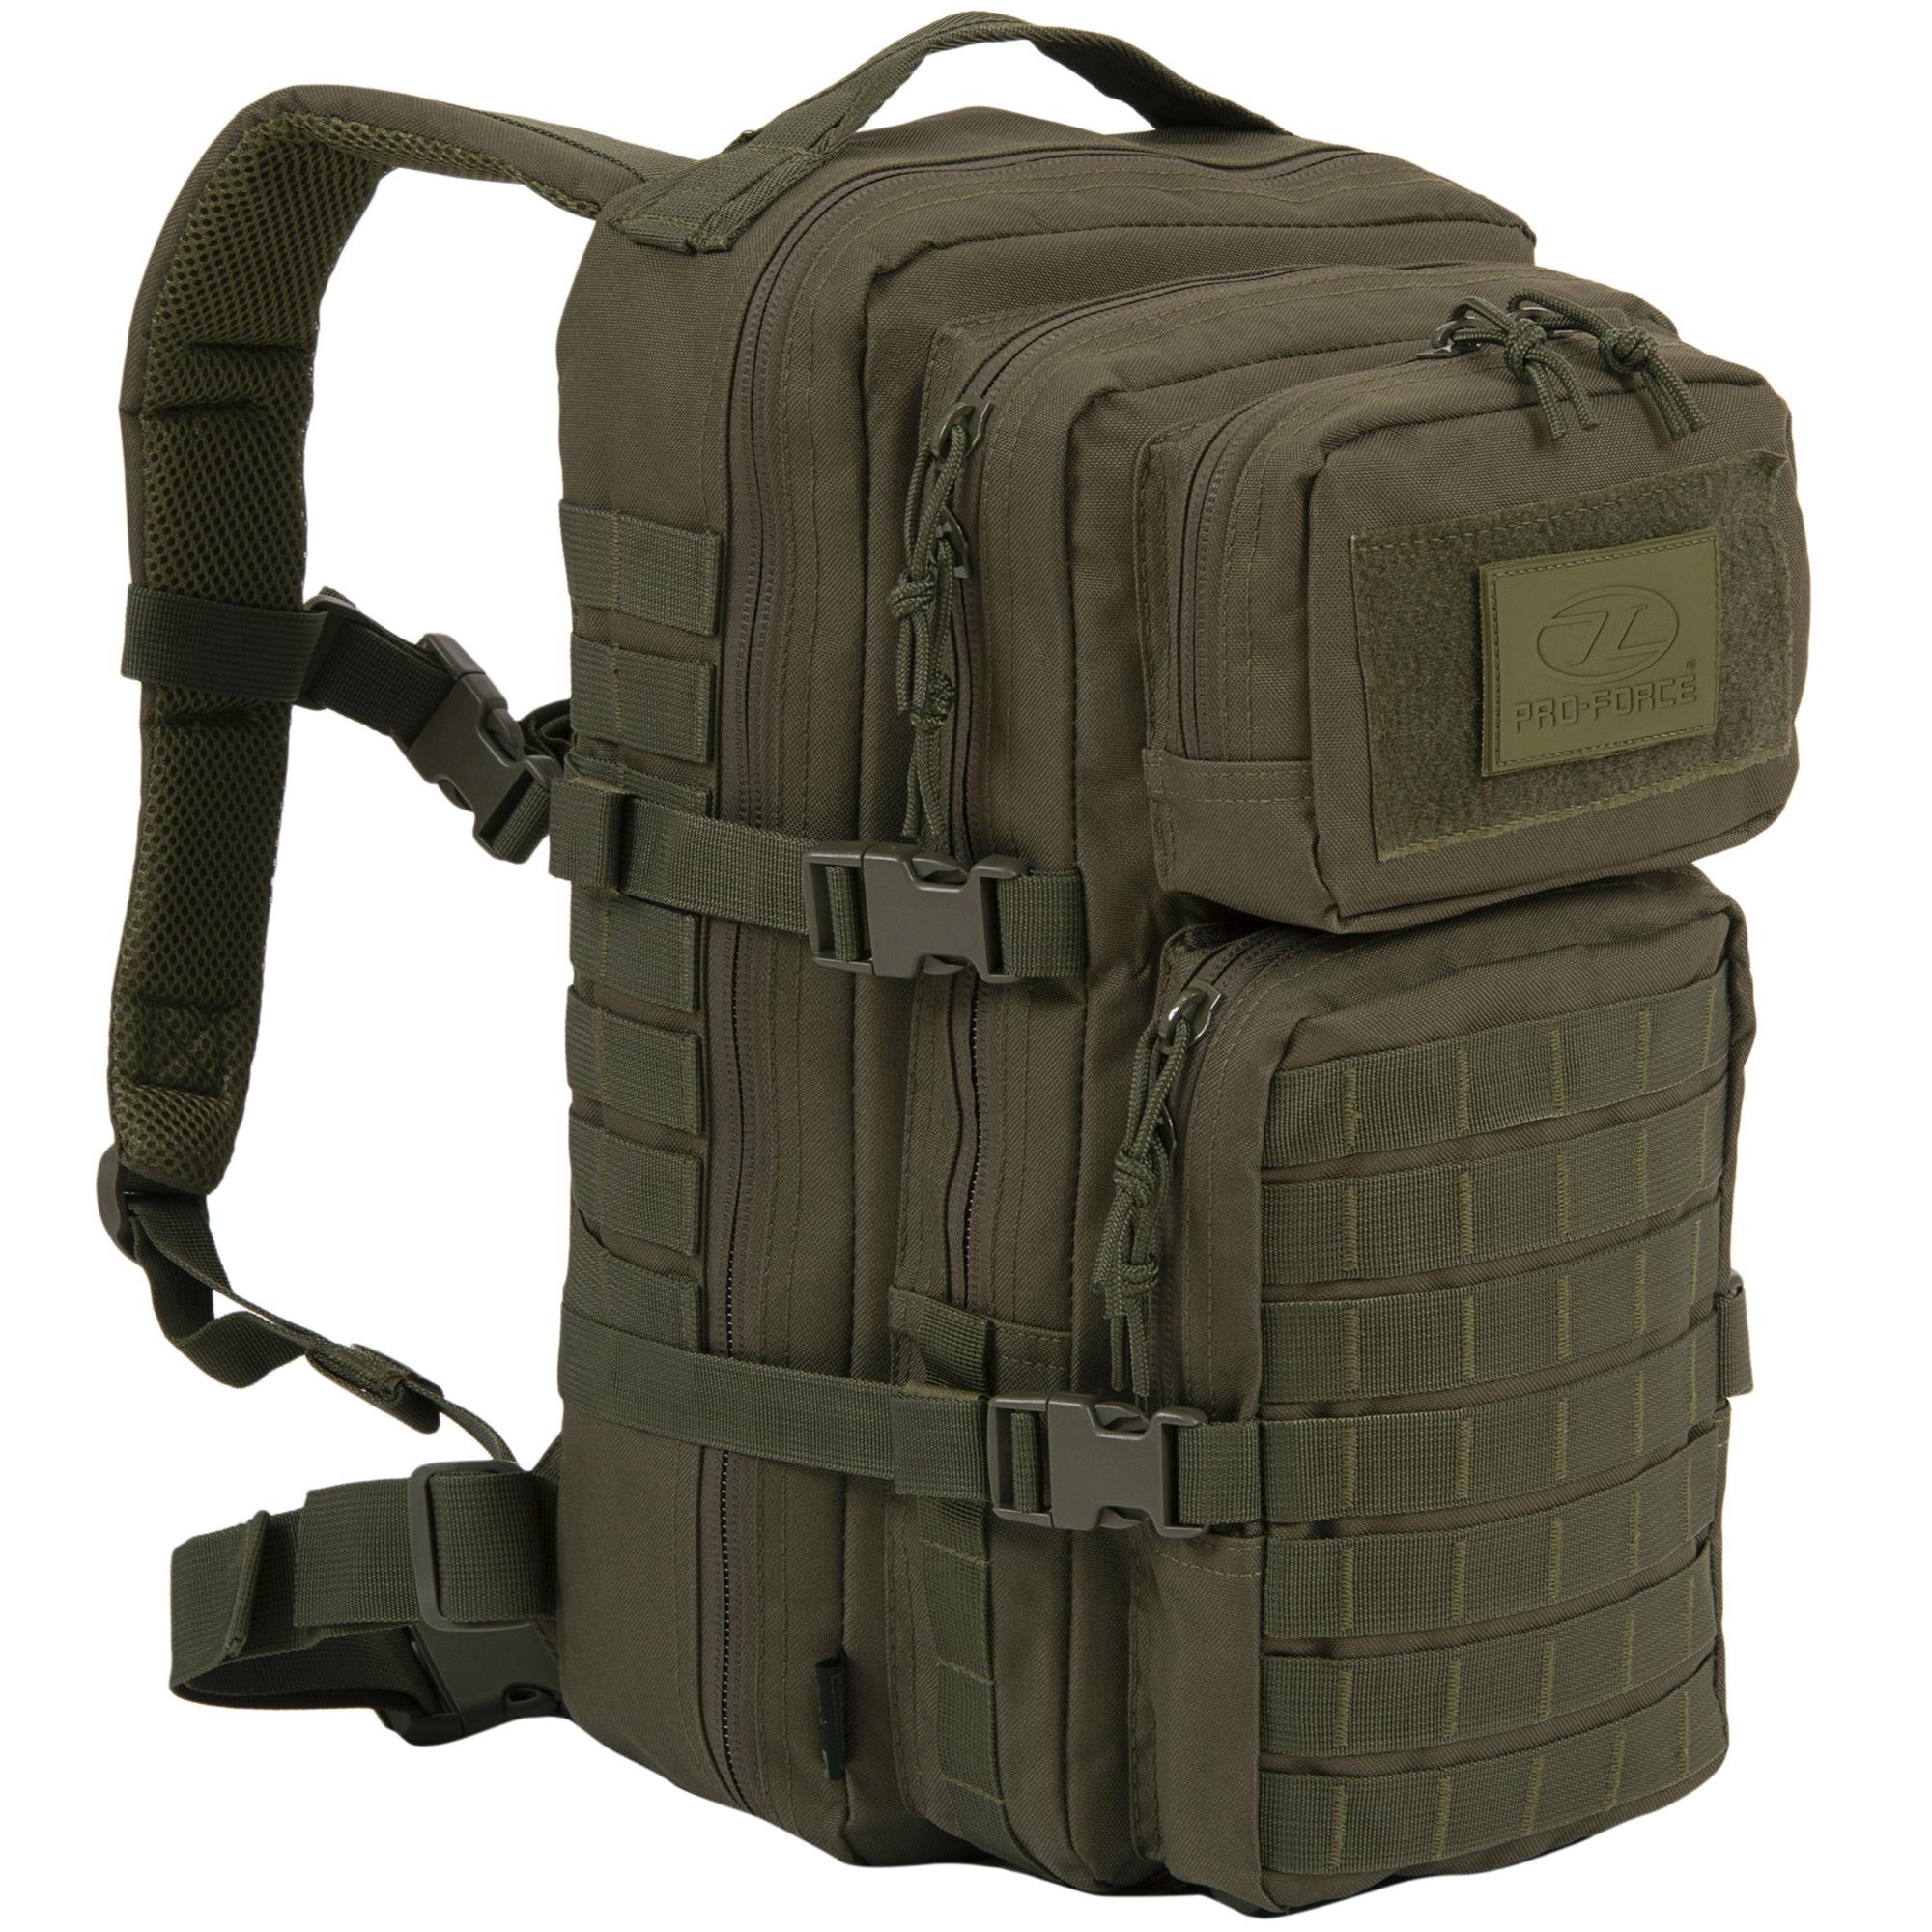 Pro-force Recon 28l legerrugzak -olive